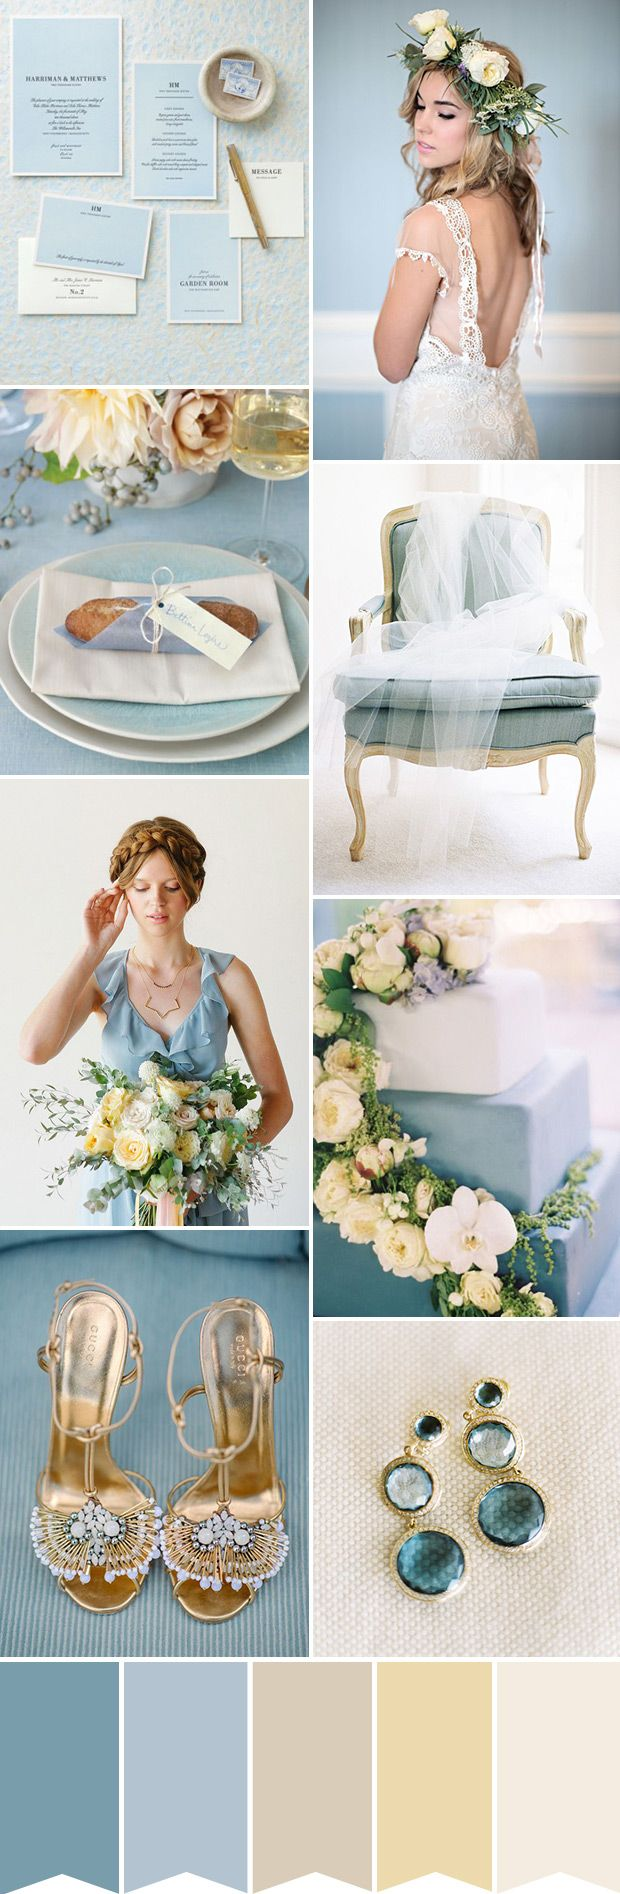 Creating a Romantic Blue and Cream Wedding Theme | Cream wedding ...